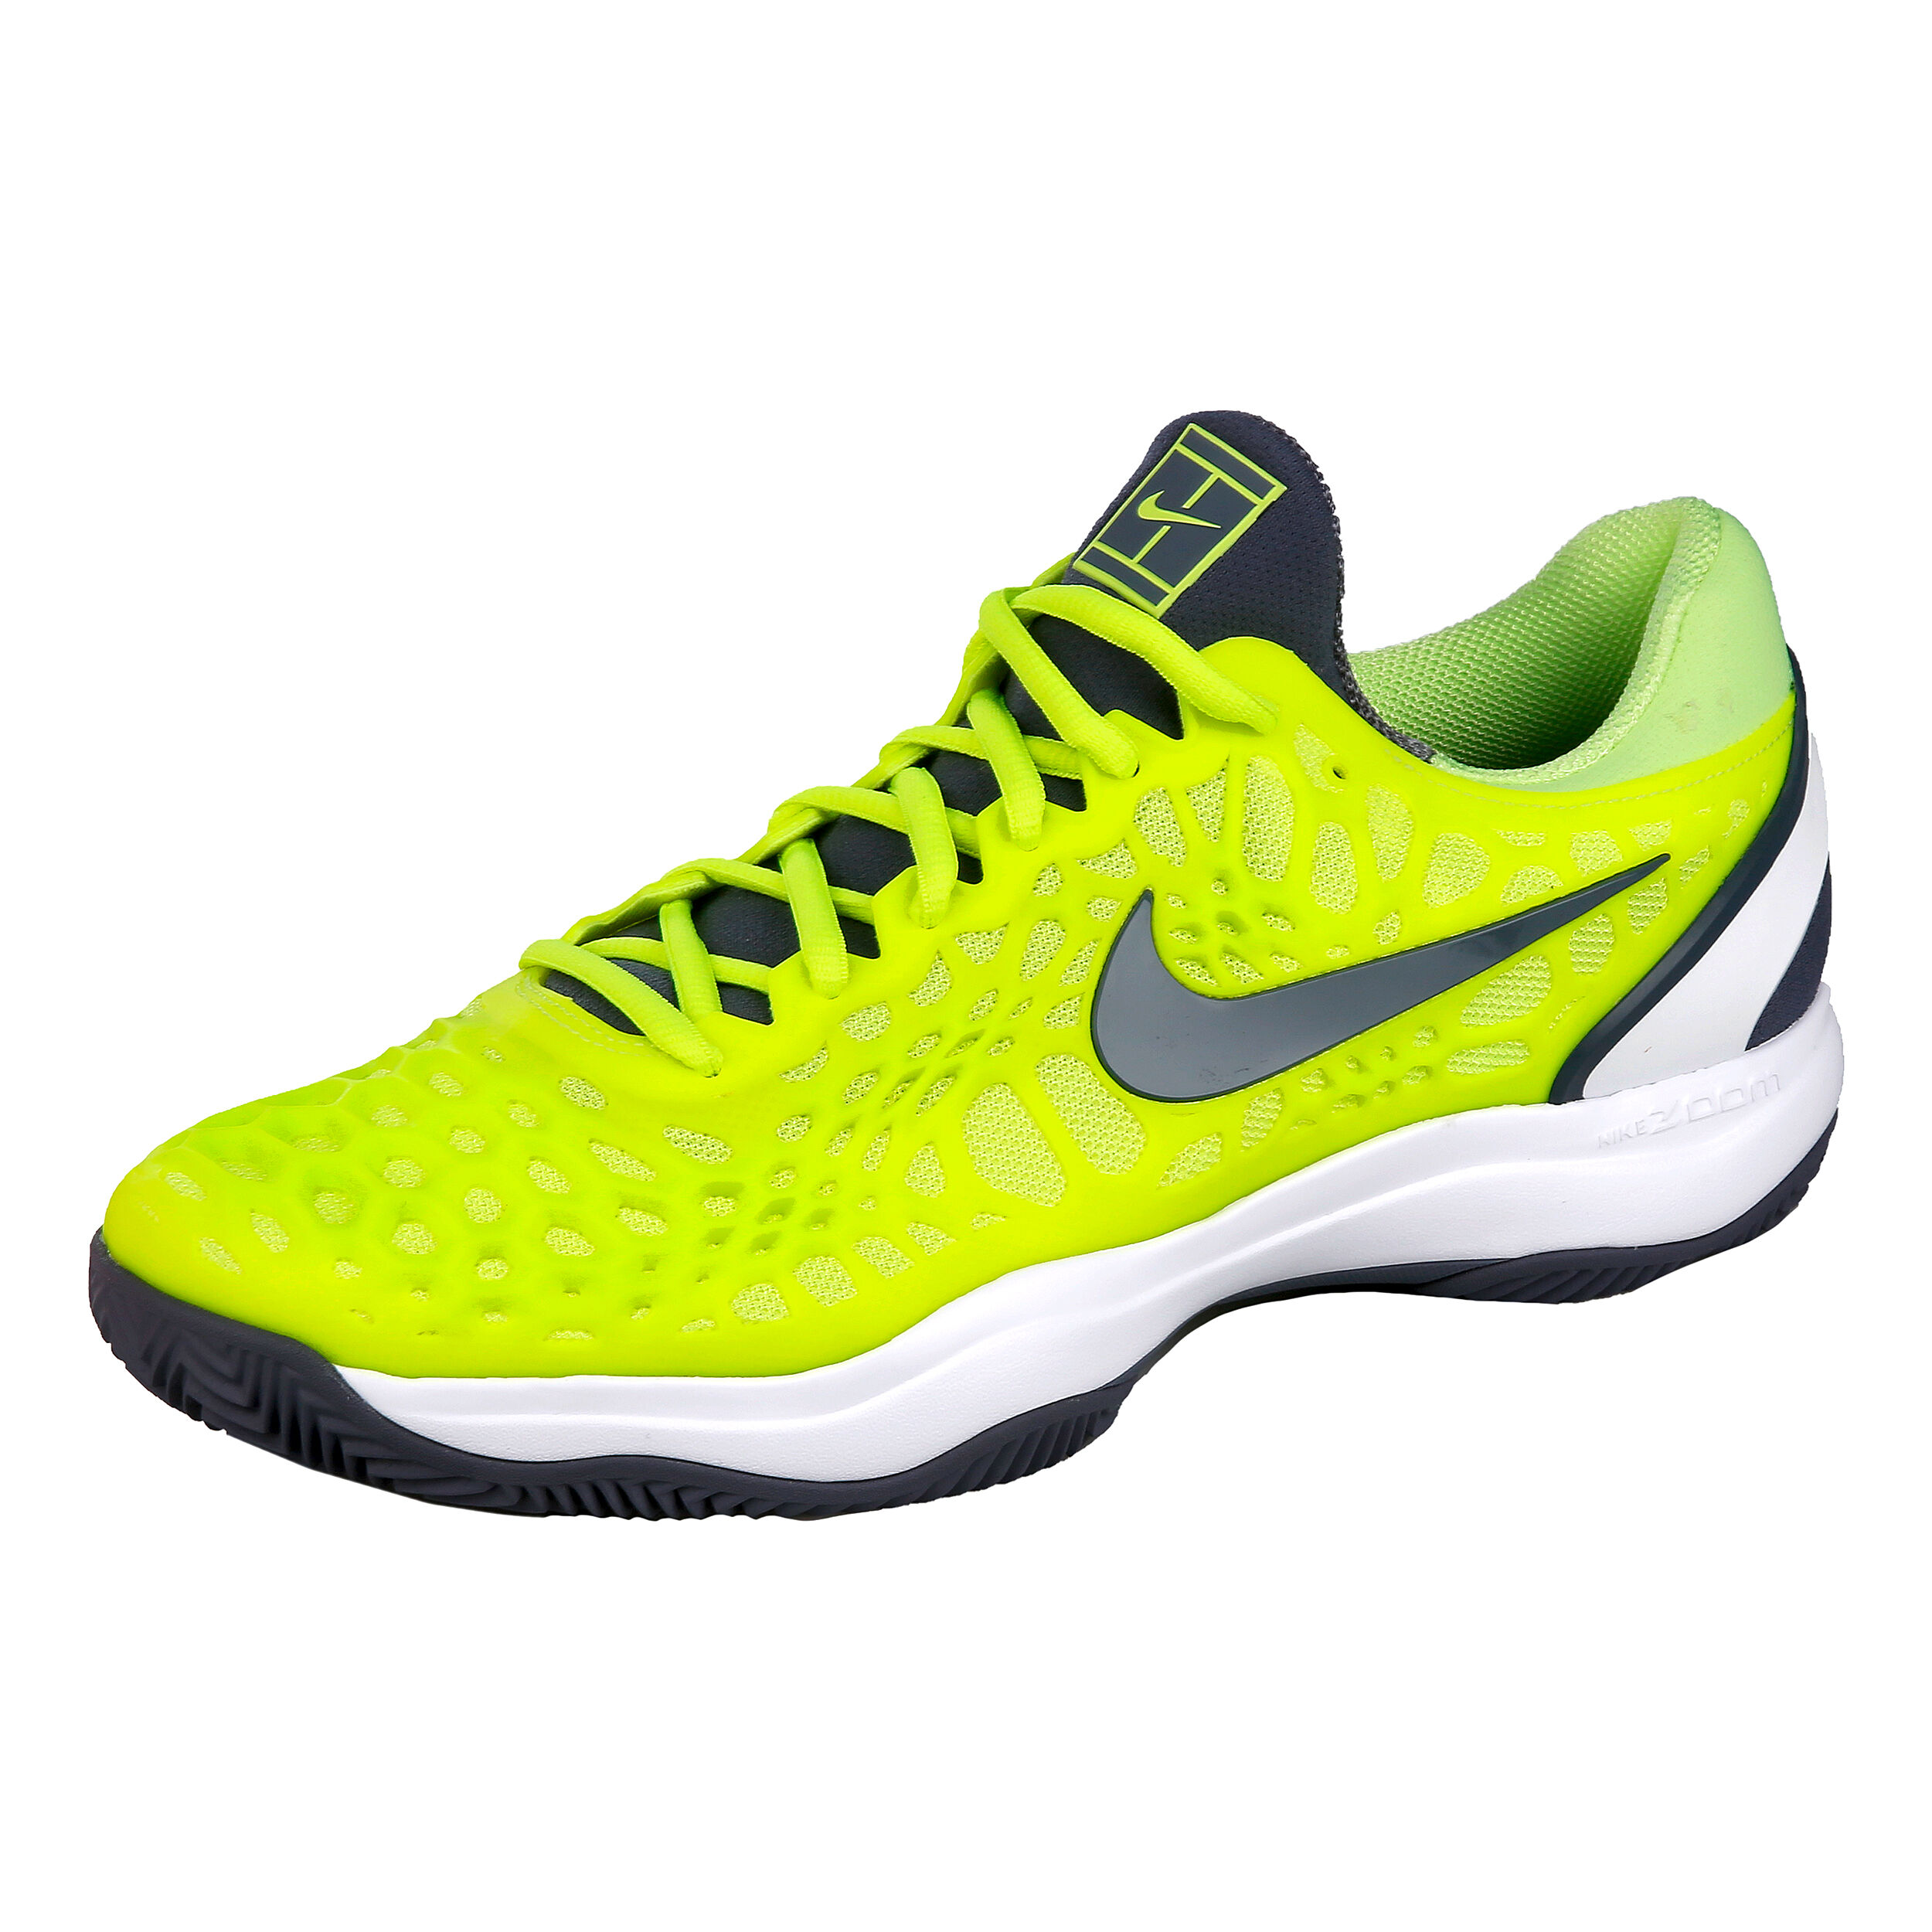 scarpe da tennis adidas terra rossa